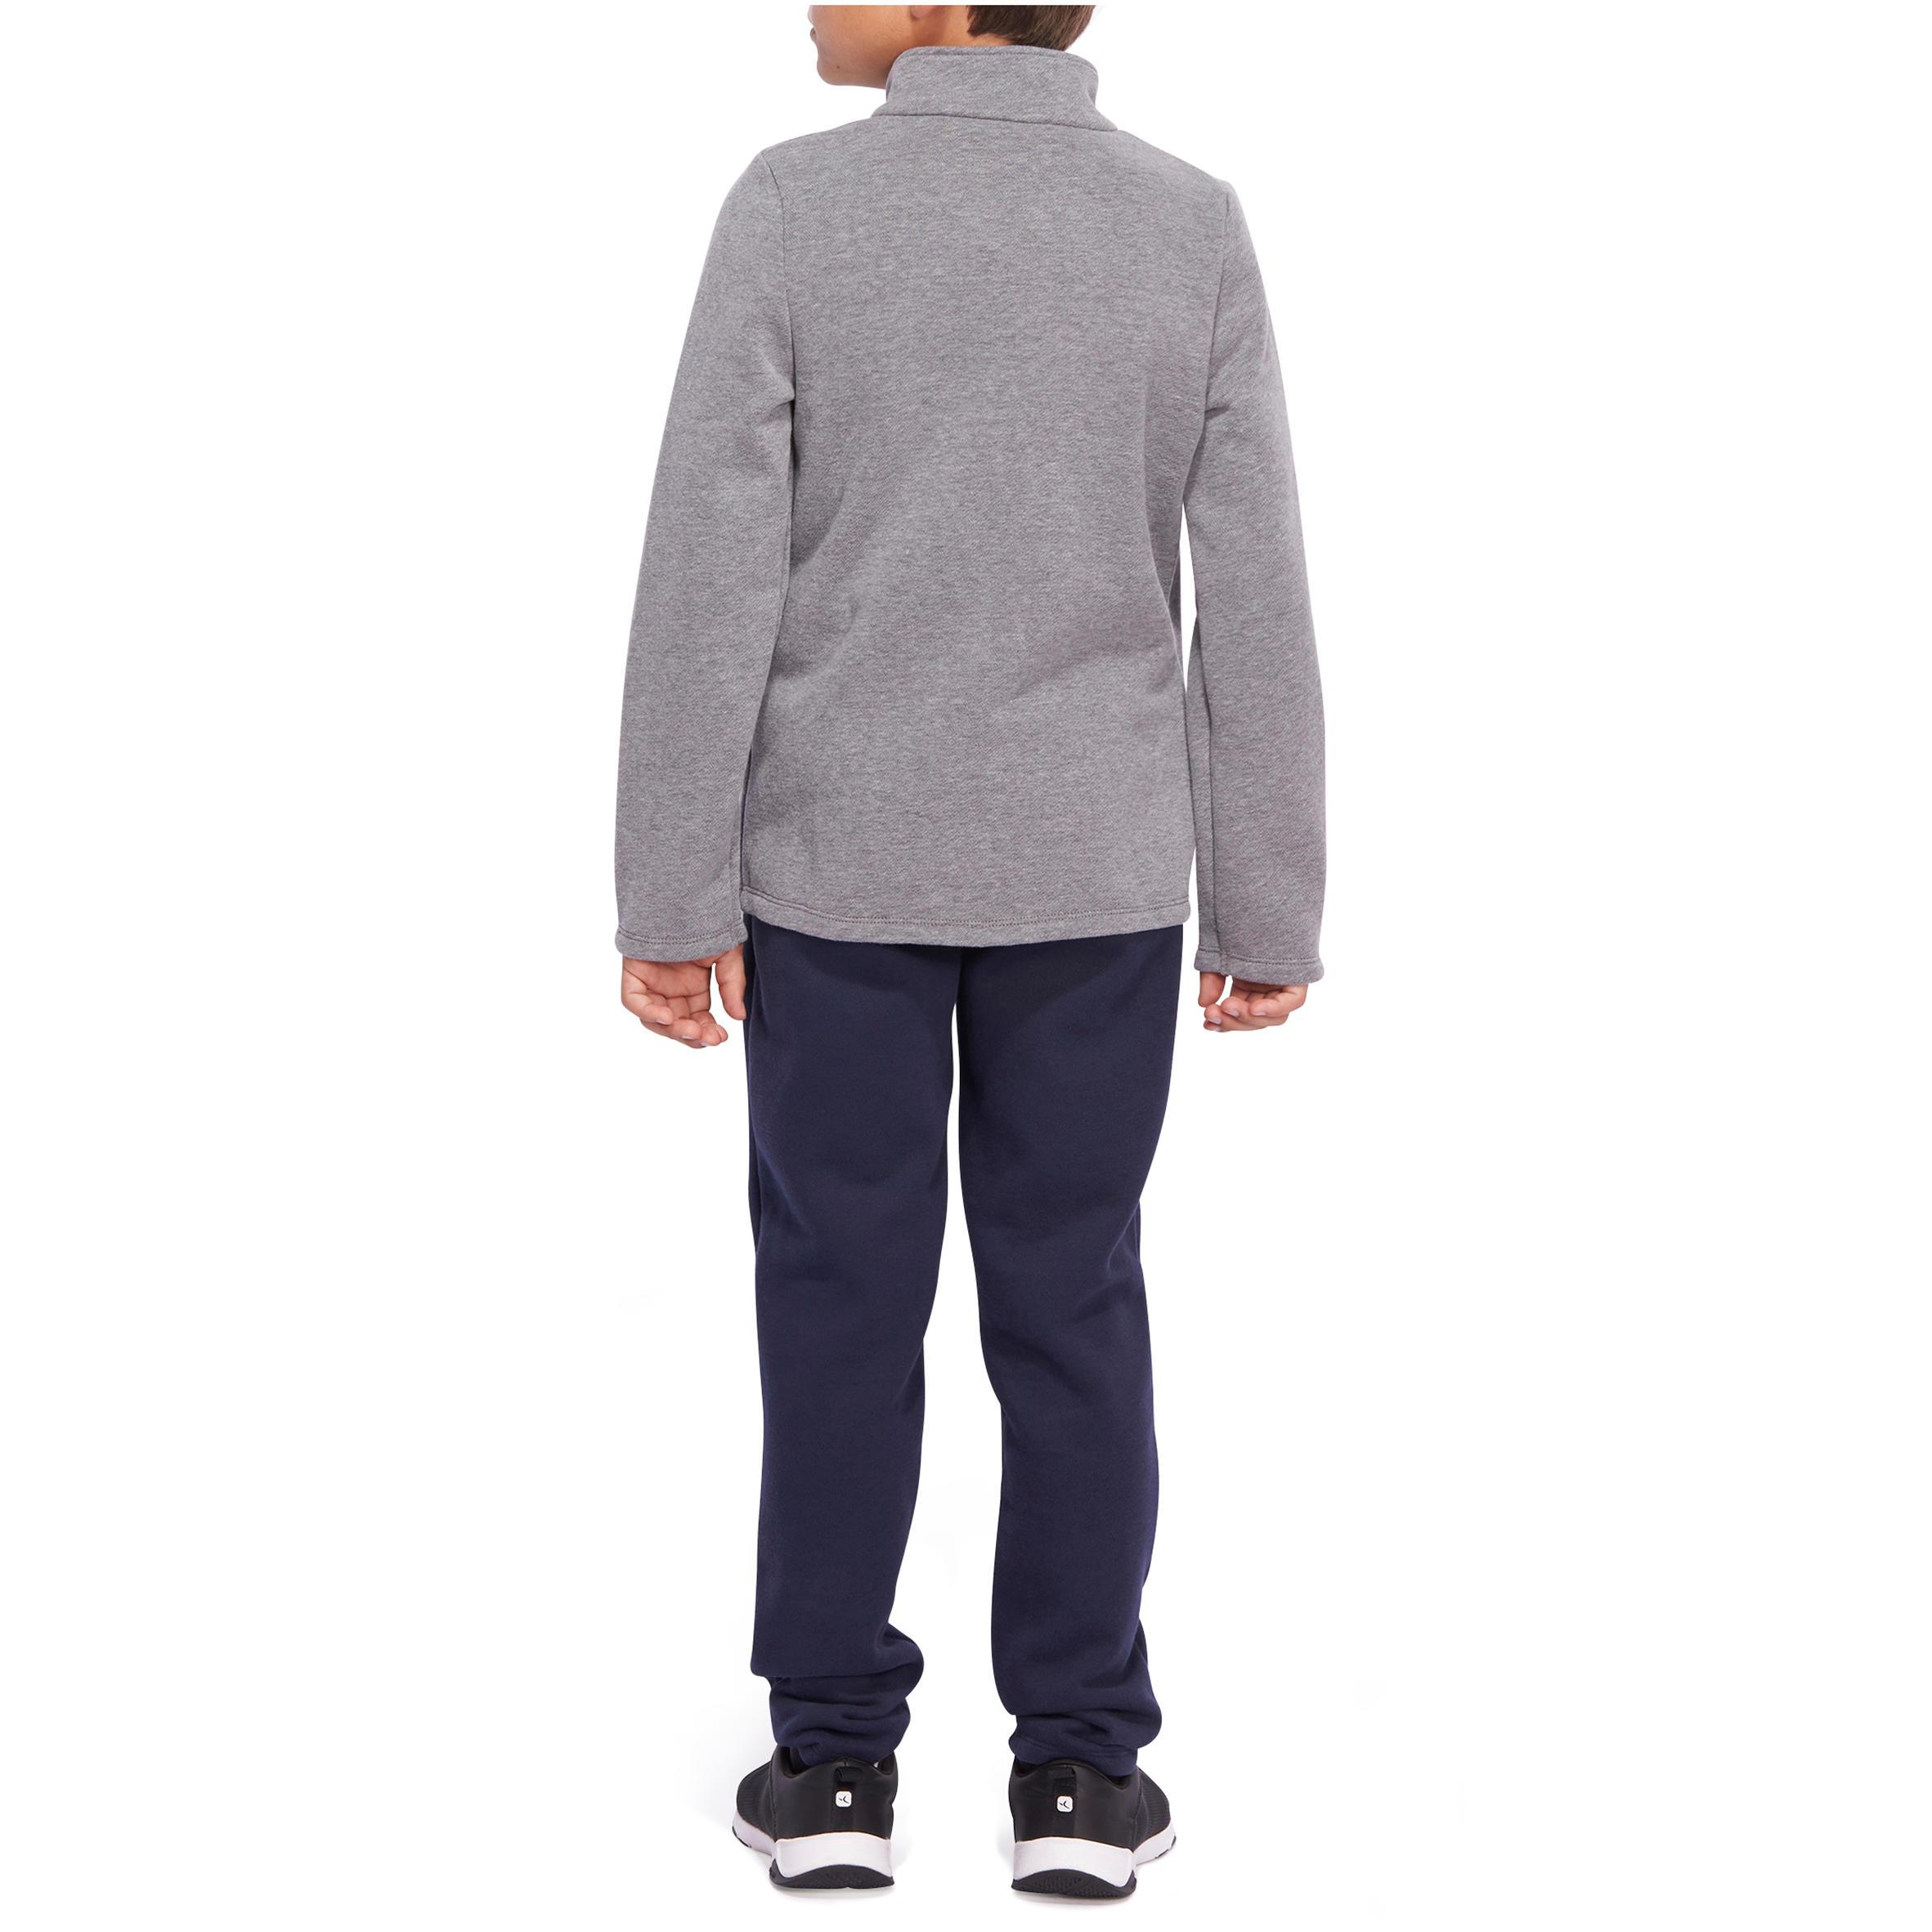 Warm'y Boys' Gym Warm Zip-Up Tracksuit - Grey Print